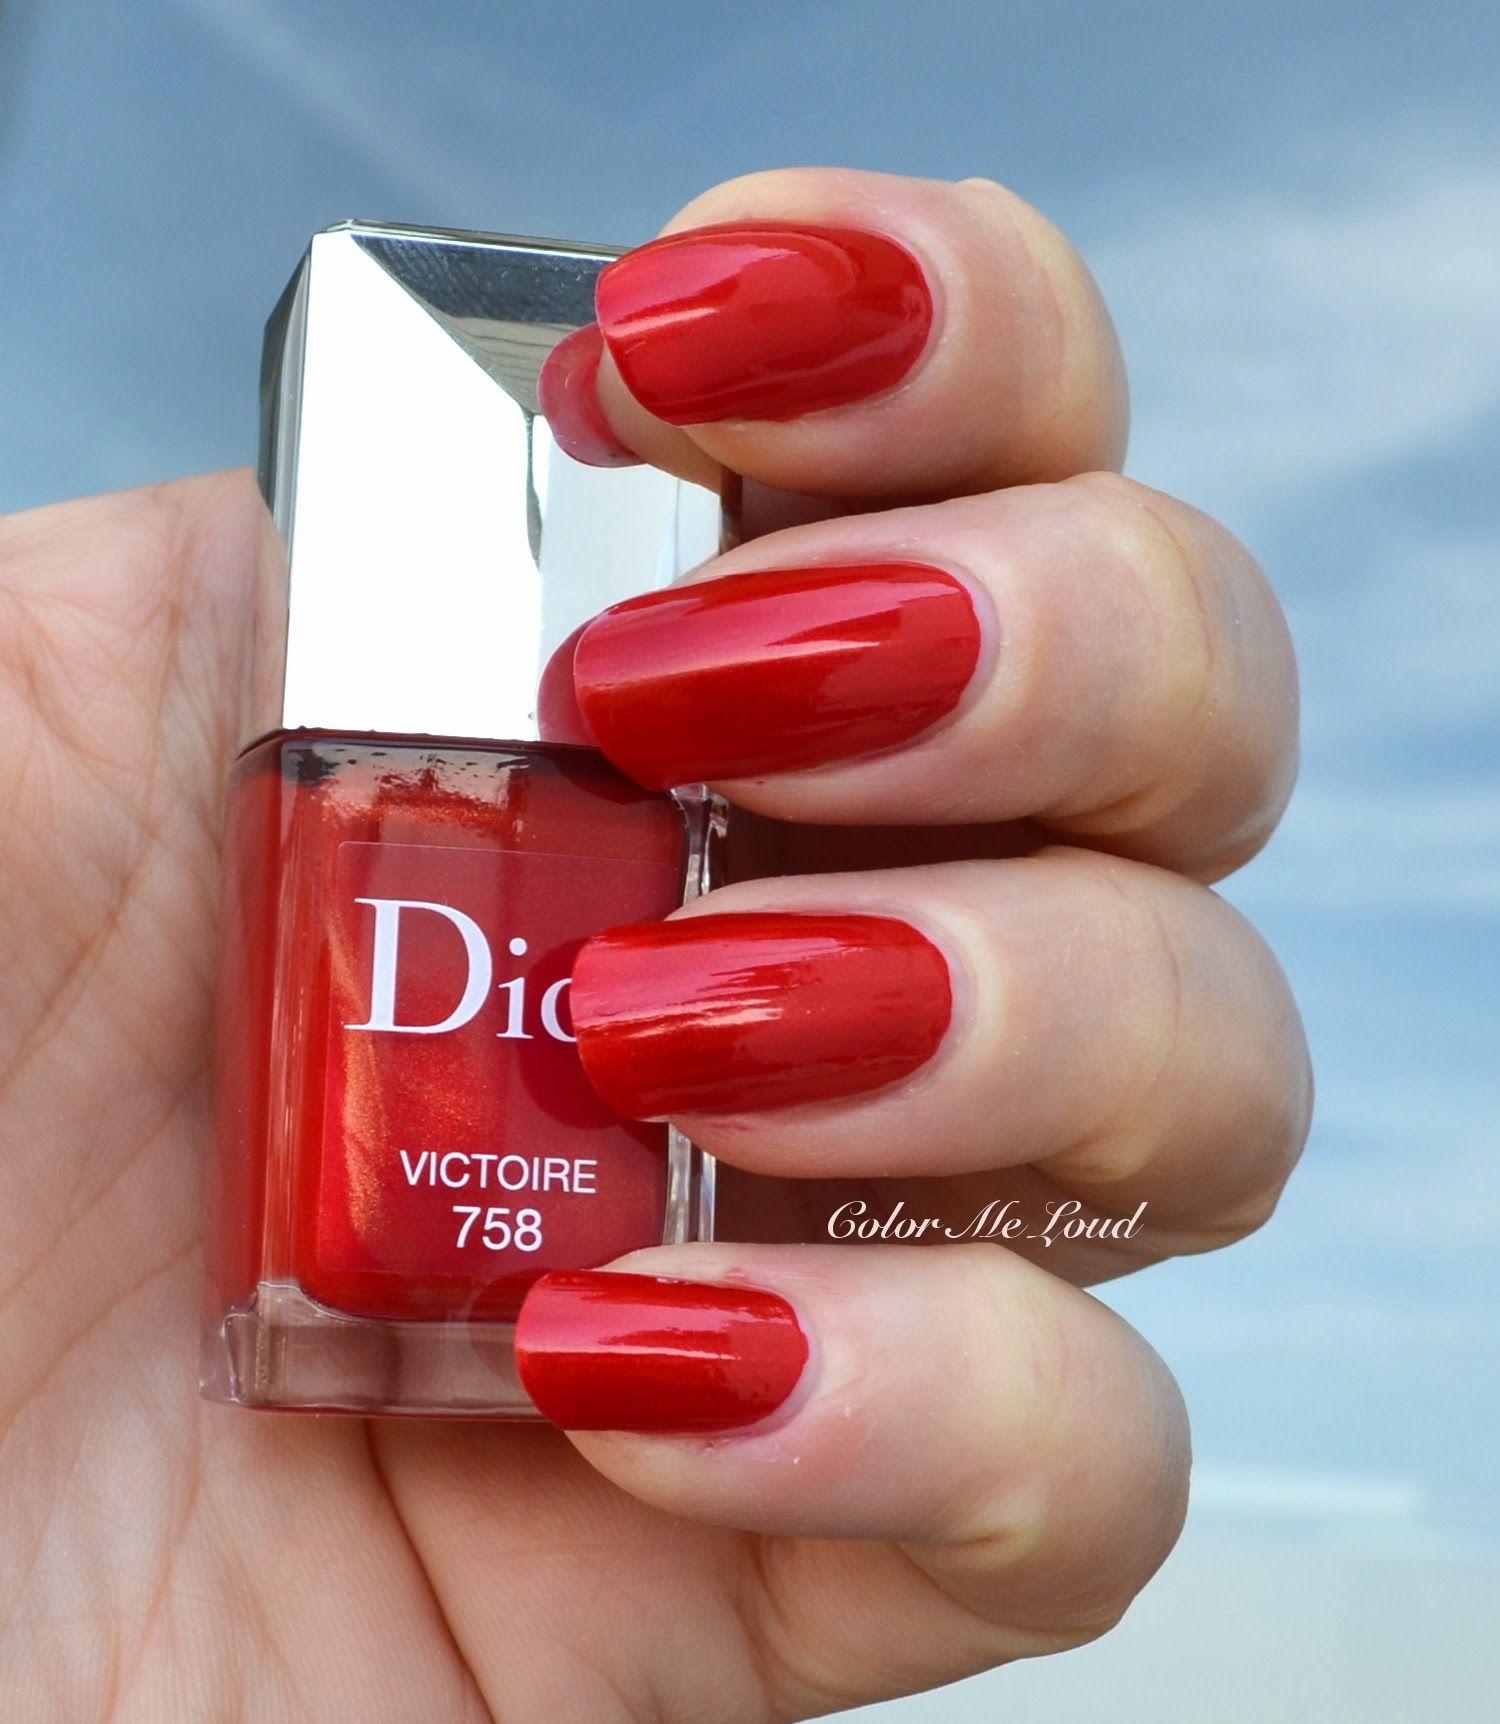 Dior Vernis #758 Victoire Gel Effect Nail Polish | Nail Polish ...